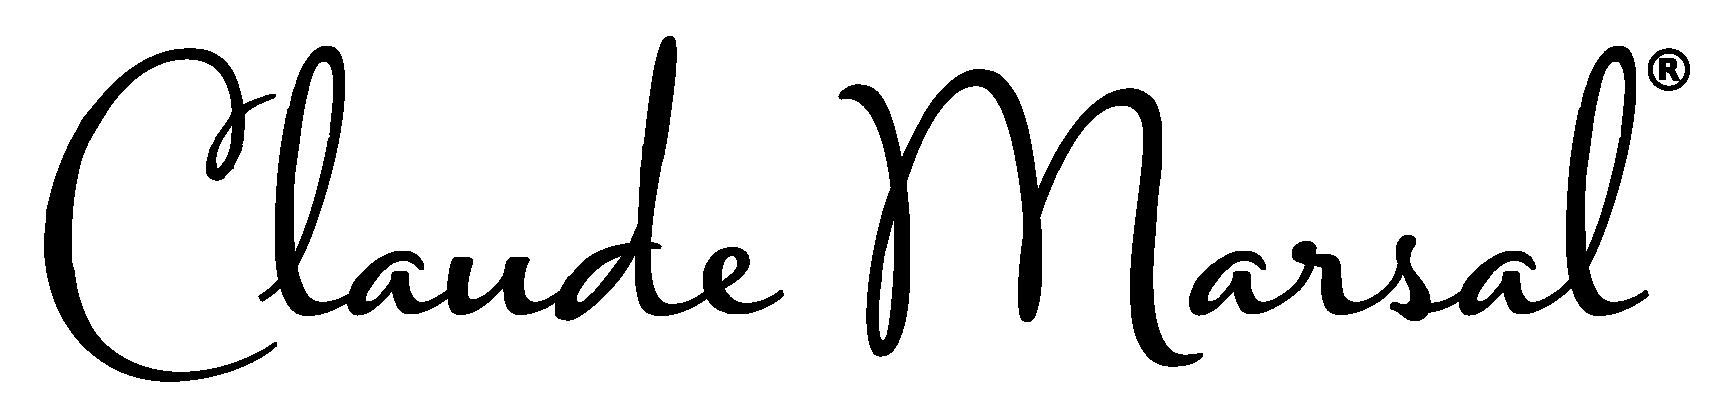 Claude Marsal Parfums Logo